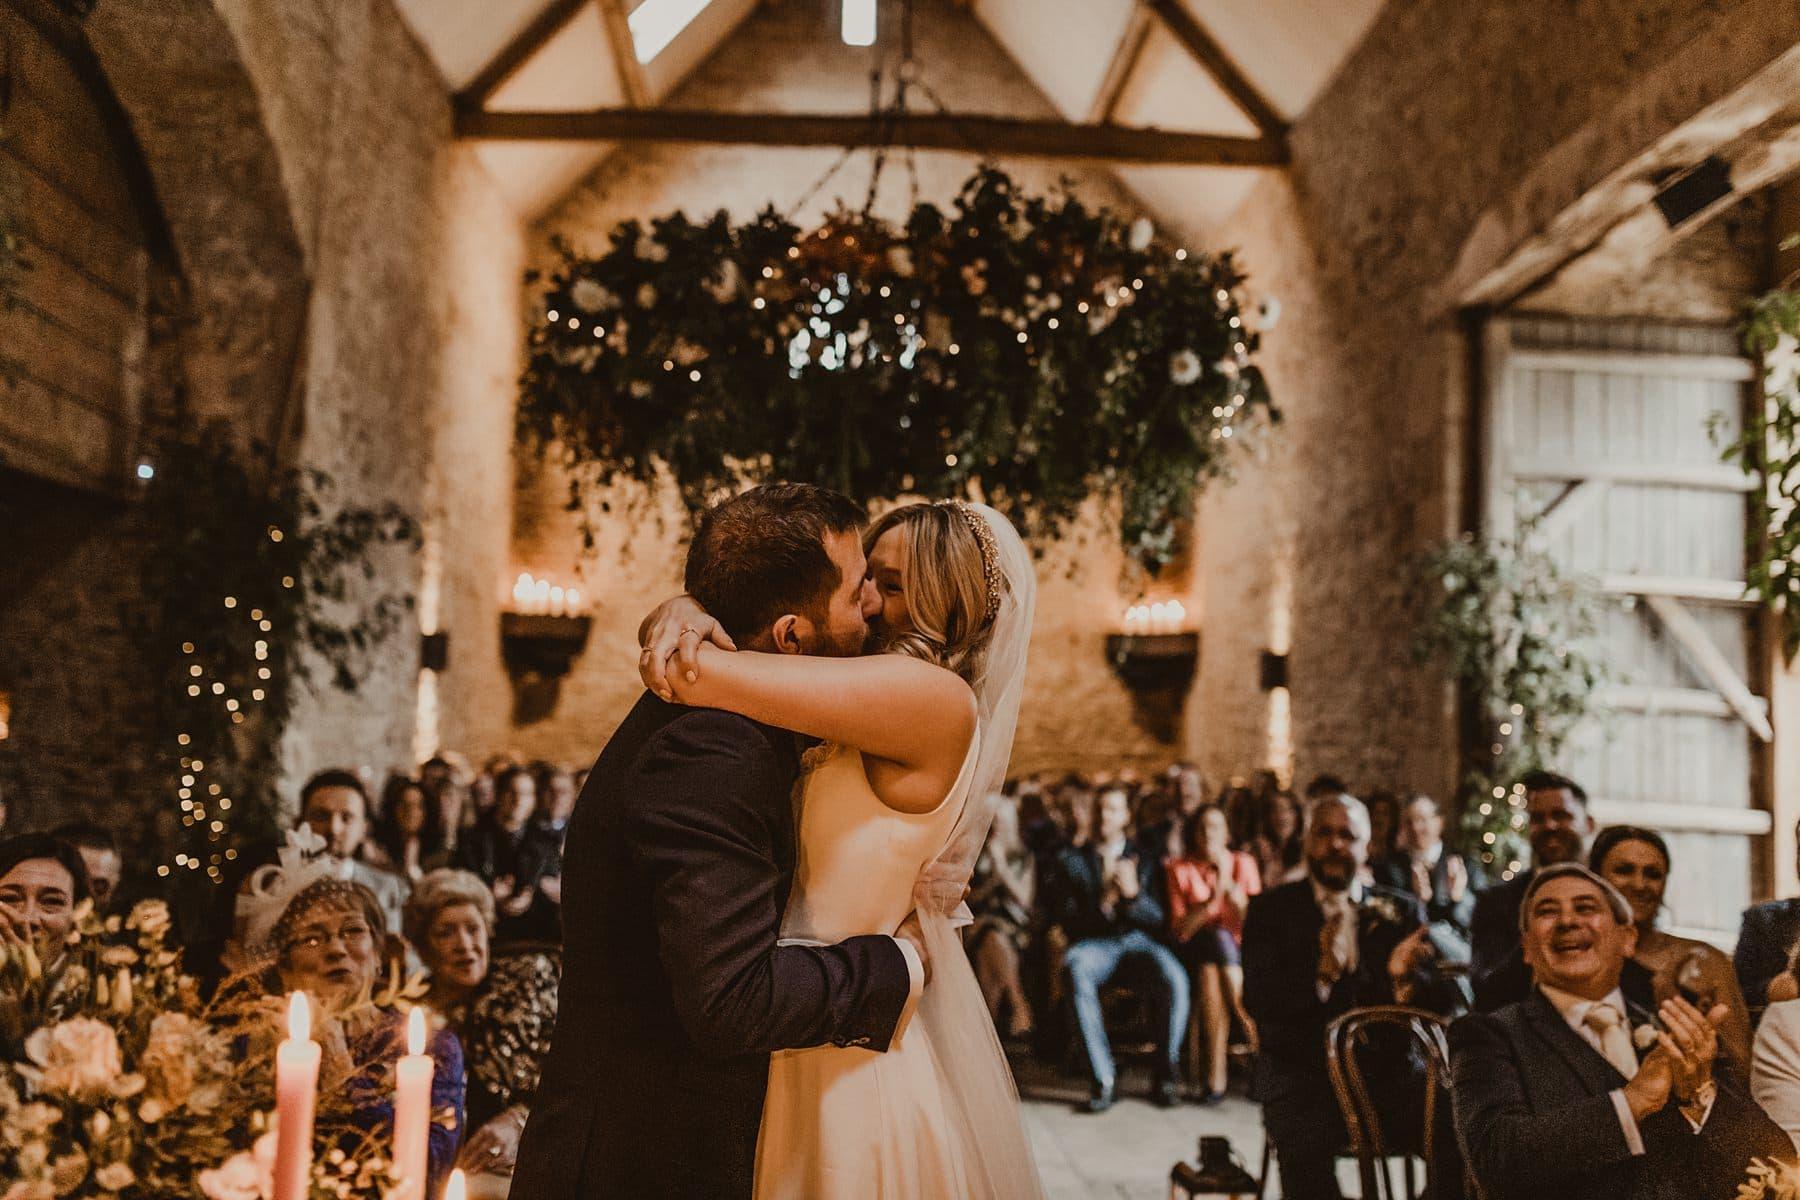 First kiss at Stone barn wedding